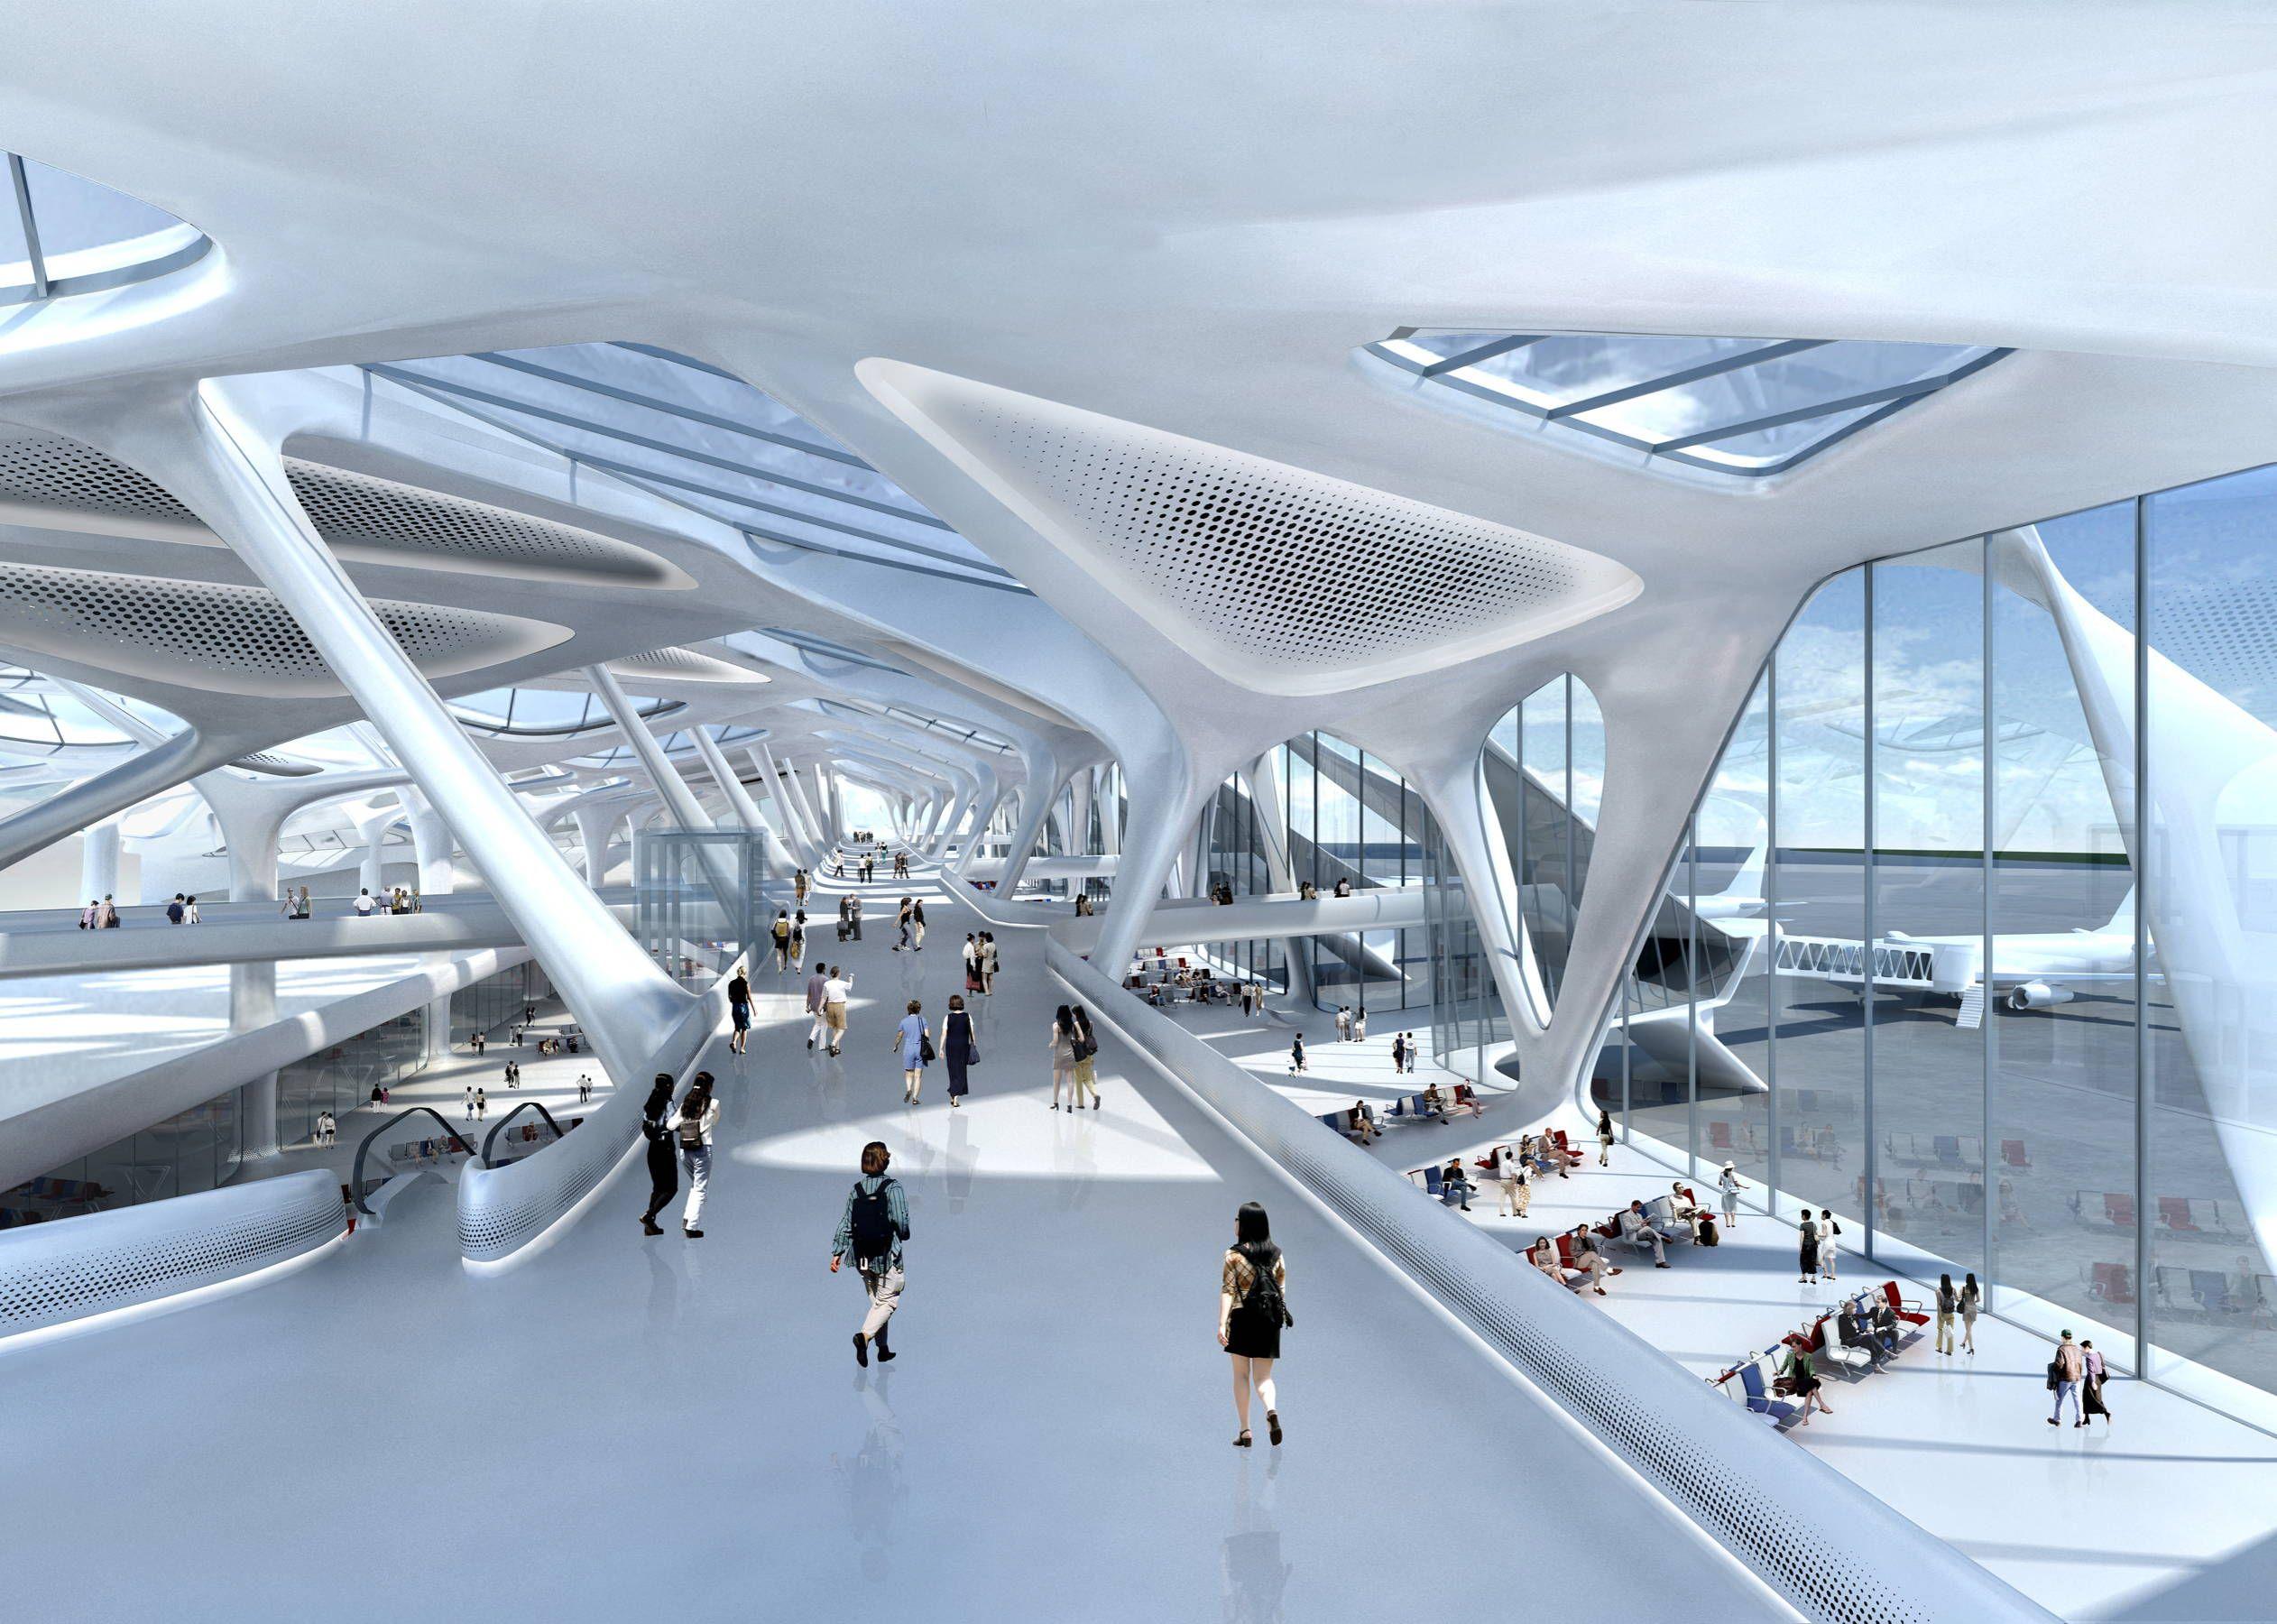 Zagreb Airport Zaha Hadid Architects Zaha Hadid Airport Design Zaha Hadid Architecture